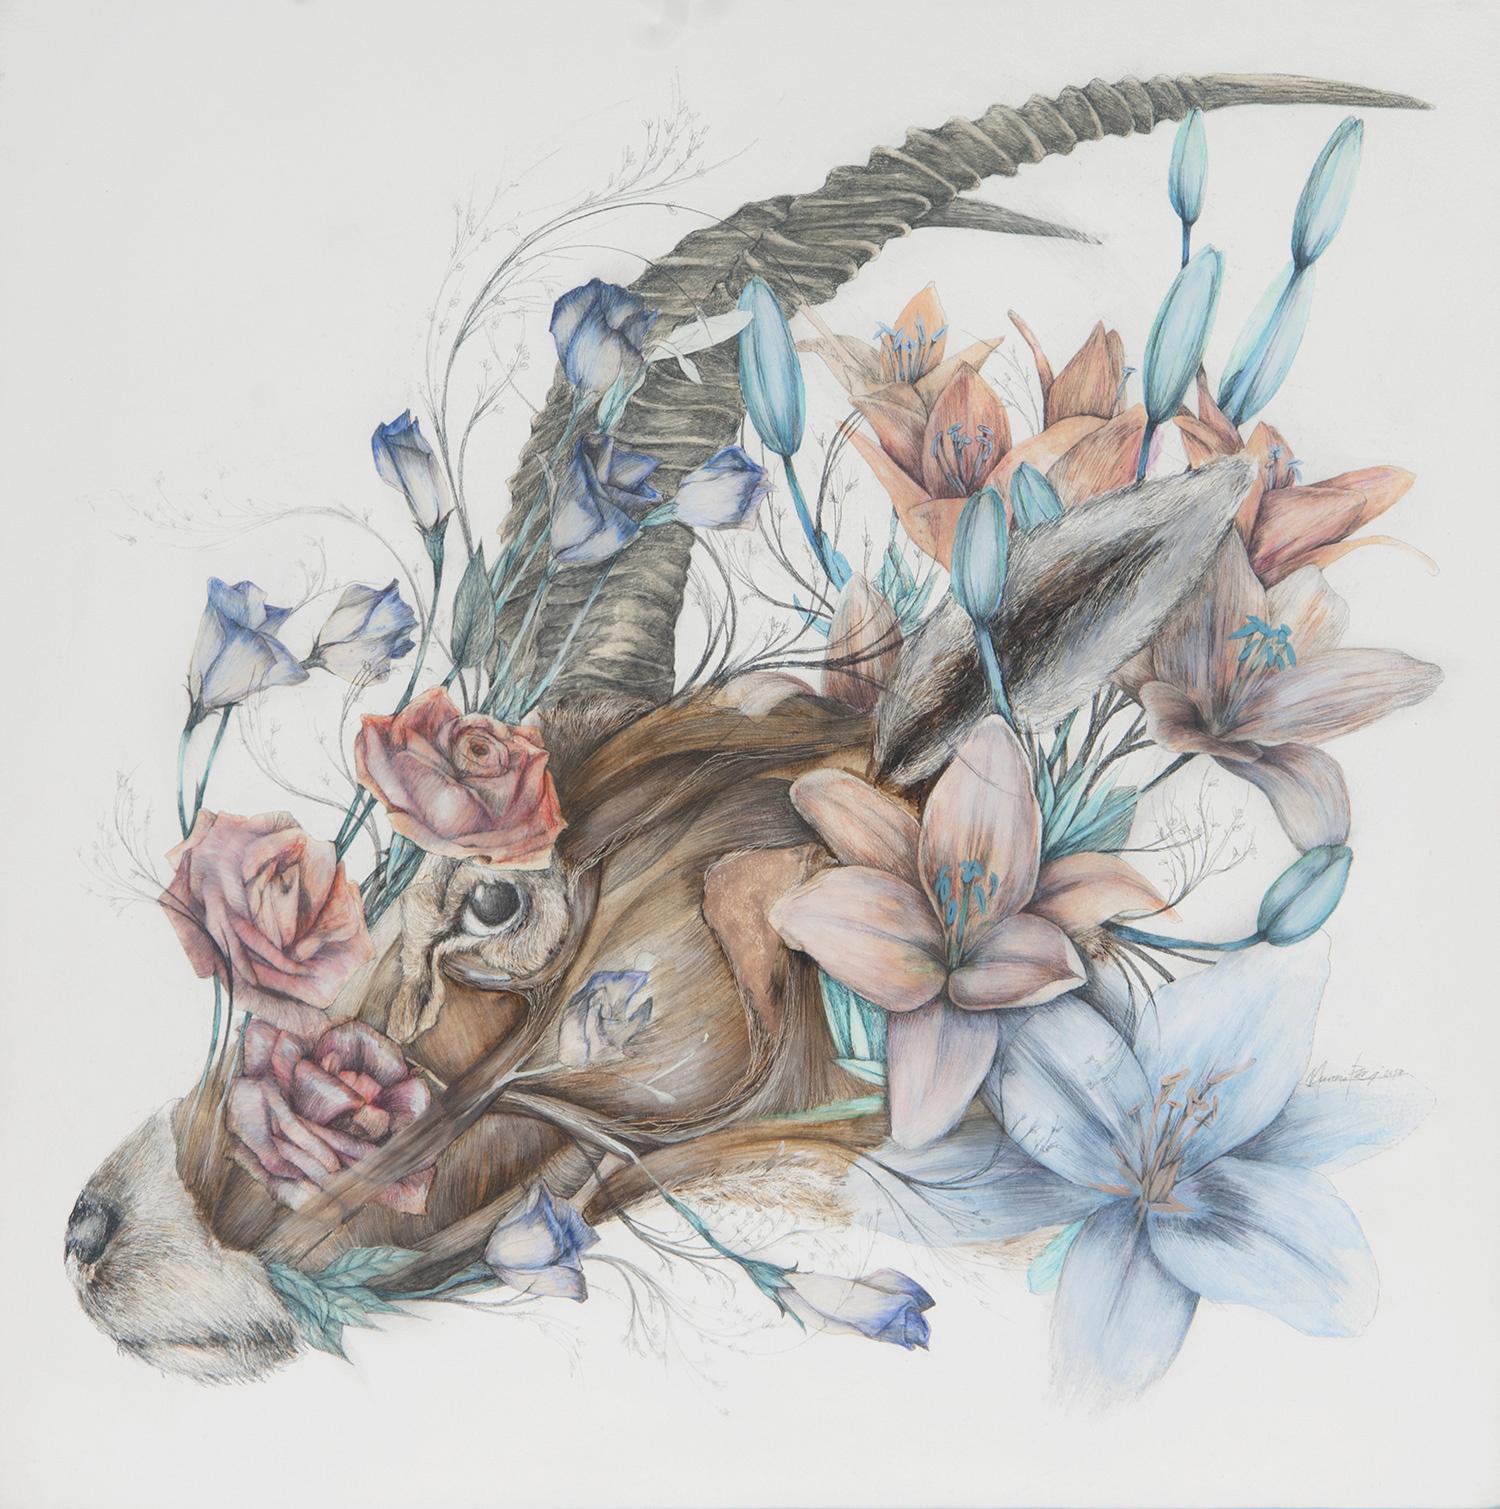 Nunzio Paci - The Awakening of the Mountain Lily